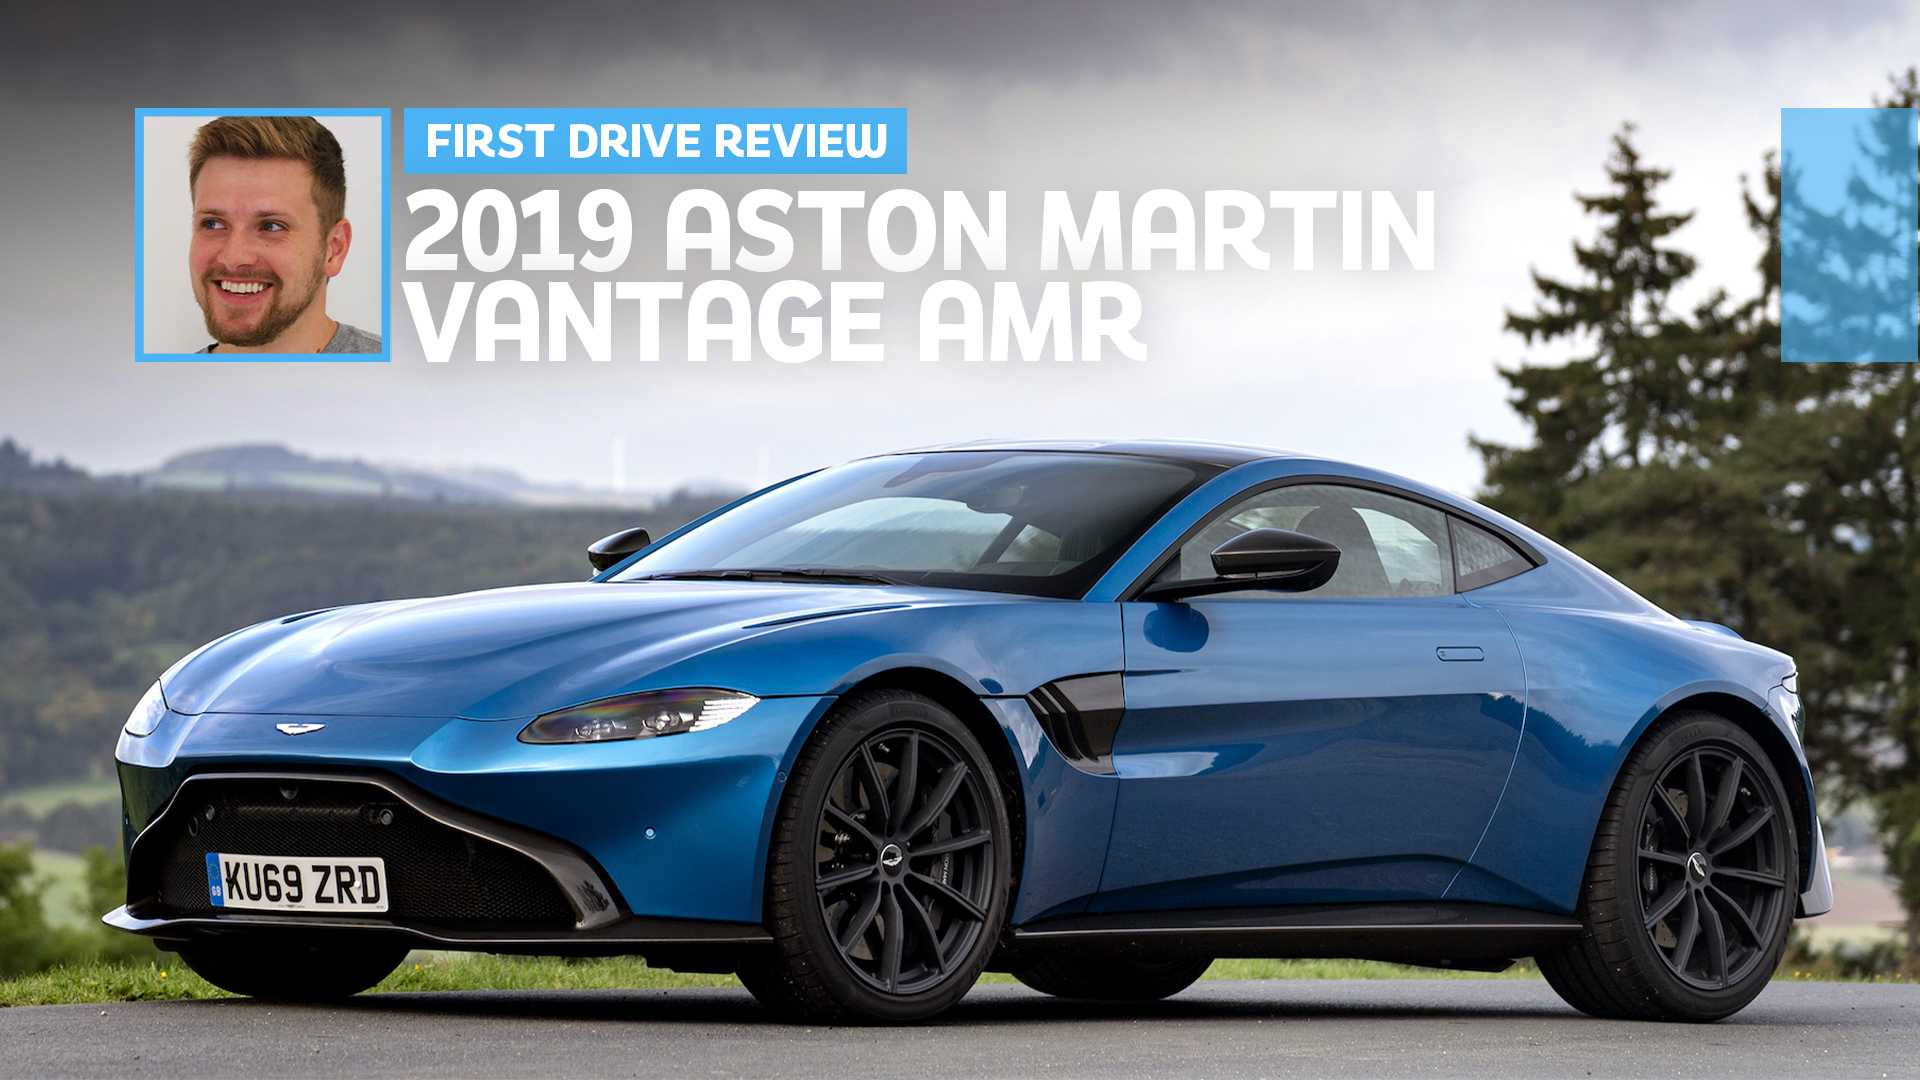 2019 Aston Martin Vantage Amr First Drive Paradigm Shift